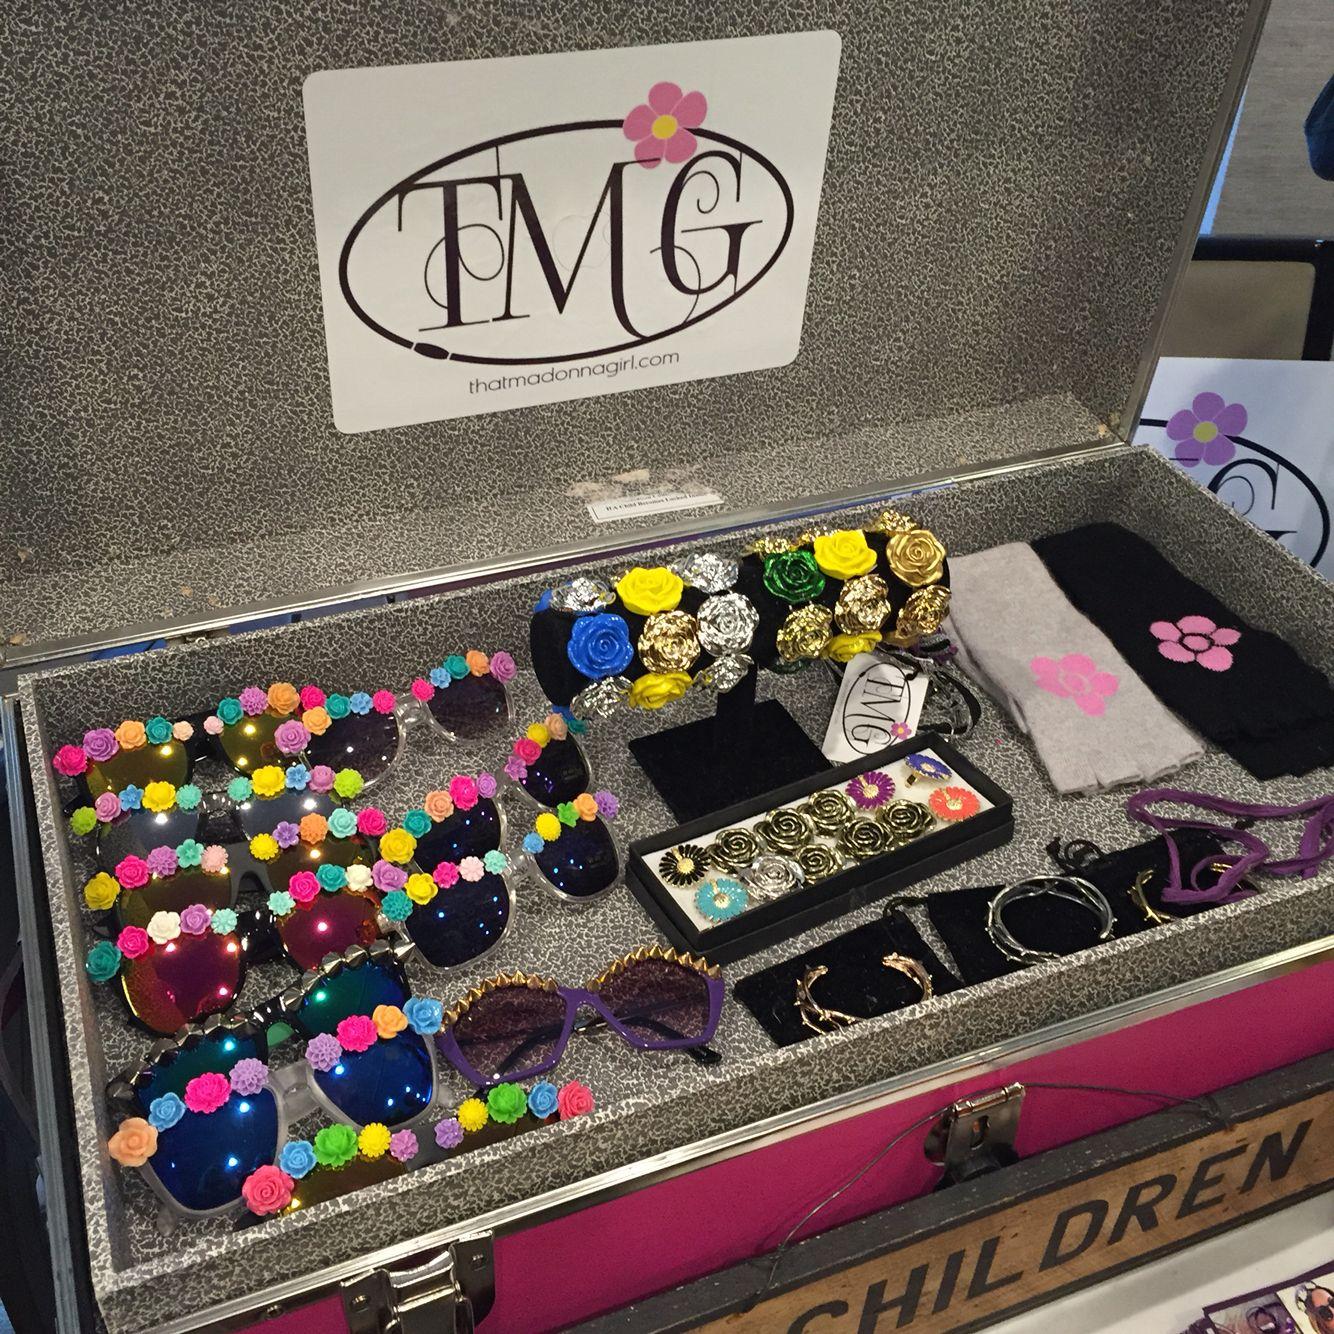 Need these ThatMadonnaGirl shades!